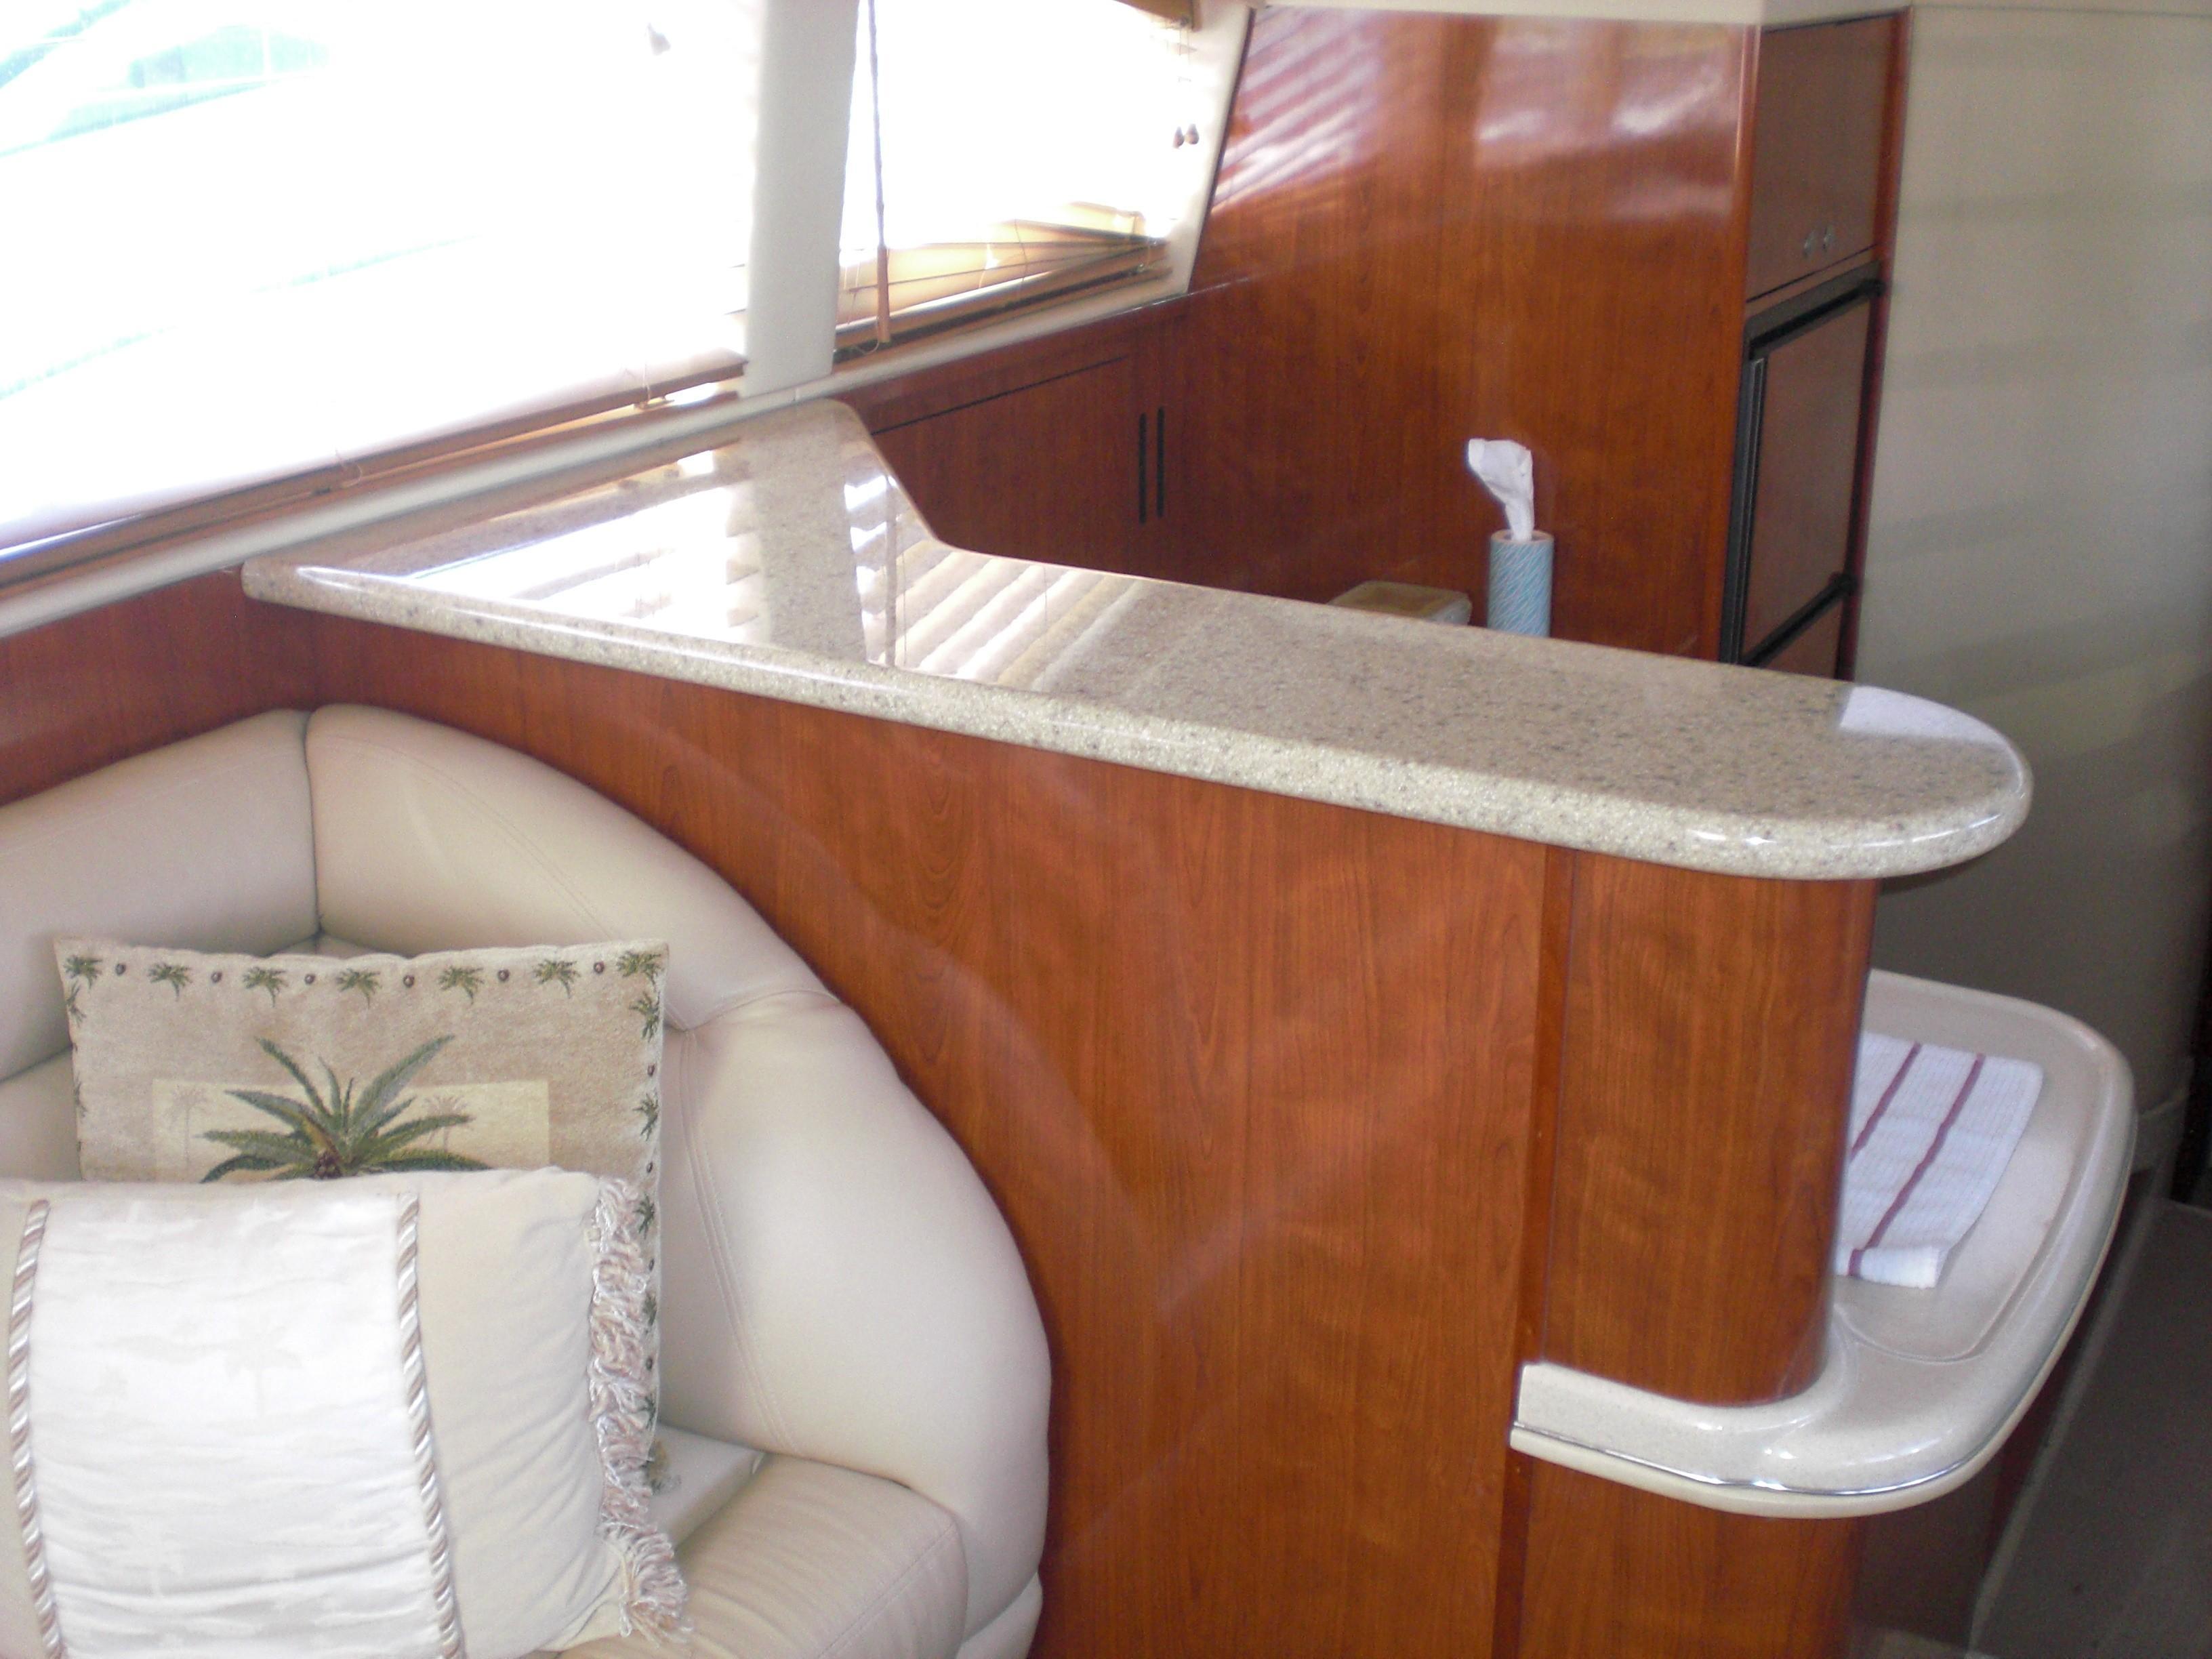 Sea Ray 480 Motor Yacht - Corian Countertops